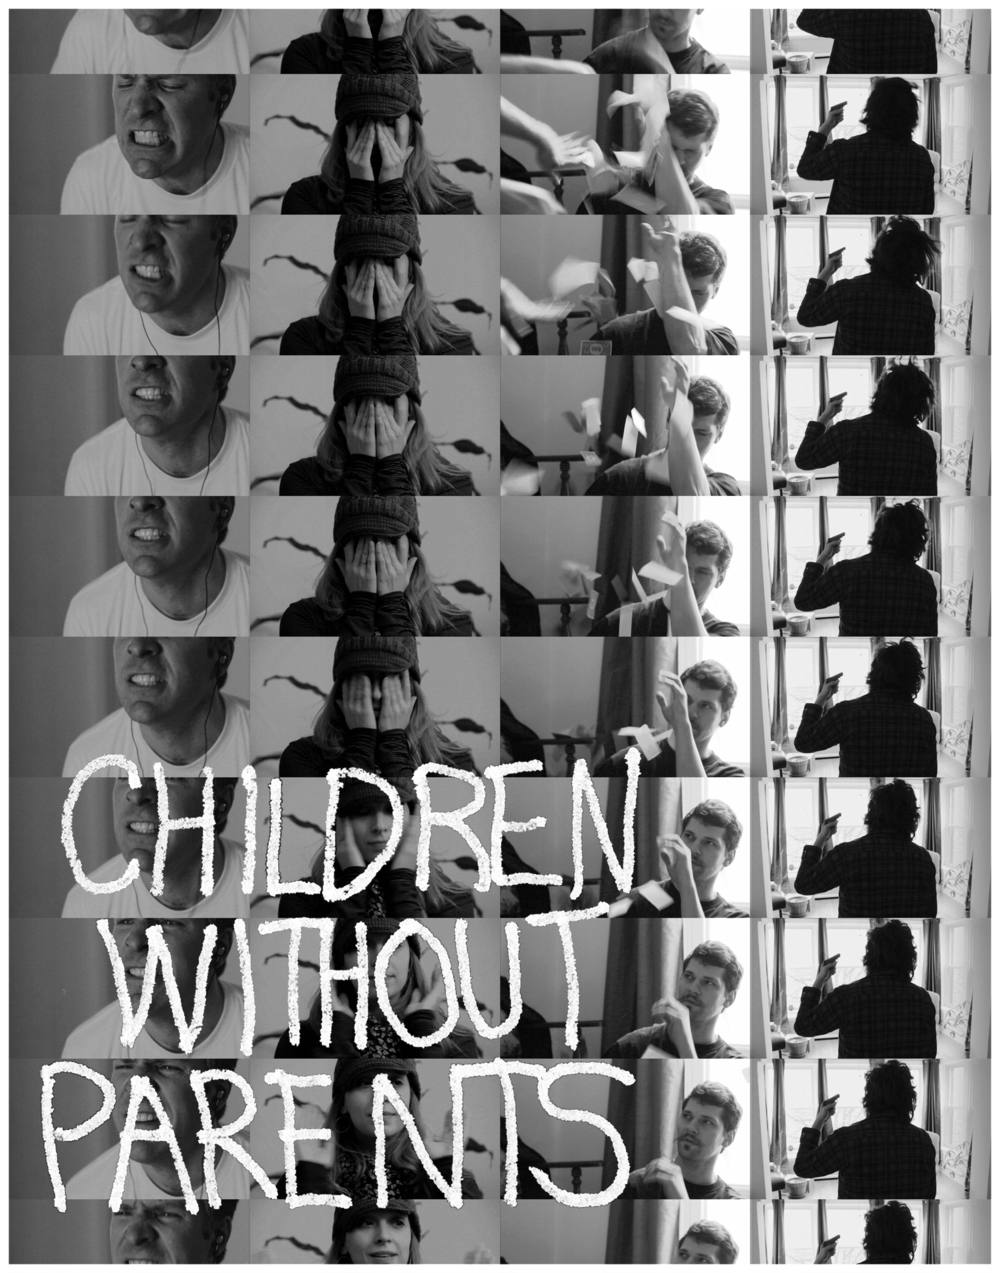 Filmstrip Poster11x14.jpg